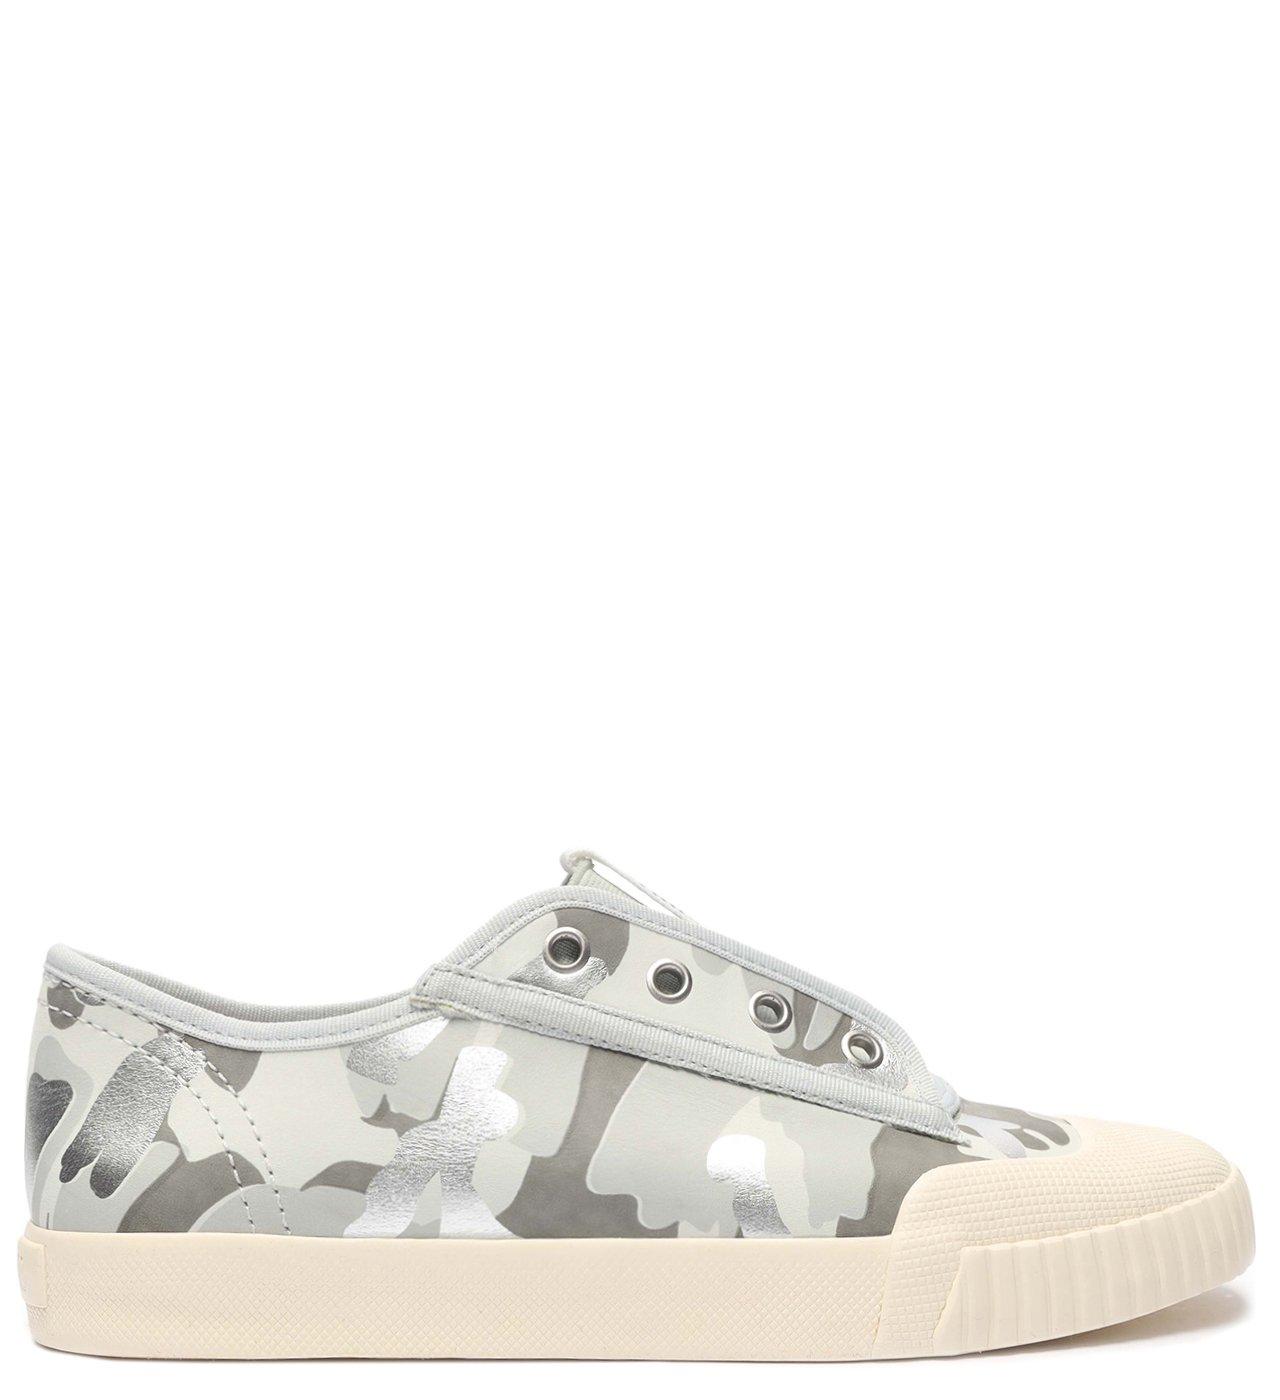 Sneaker Smash Camouflage White | Schutz